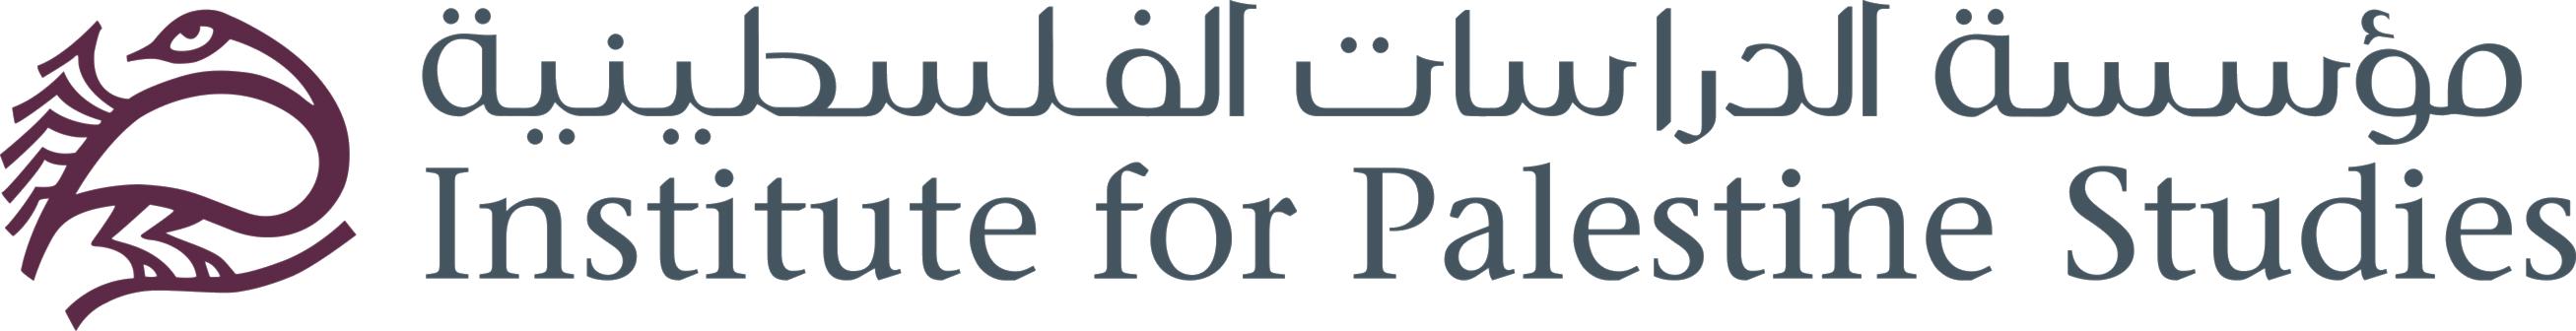 Institute for Palestinian Studies